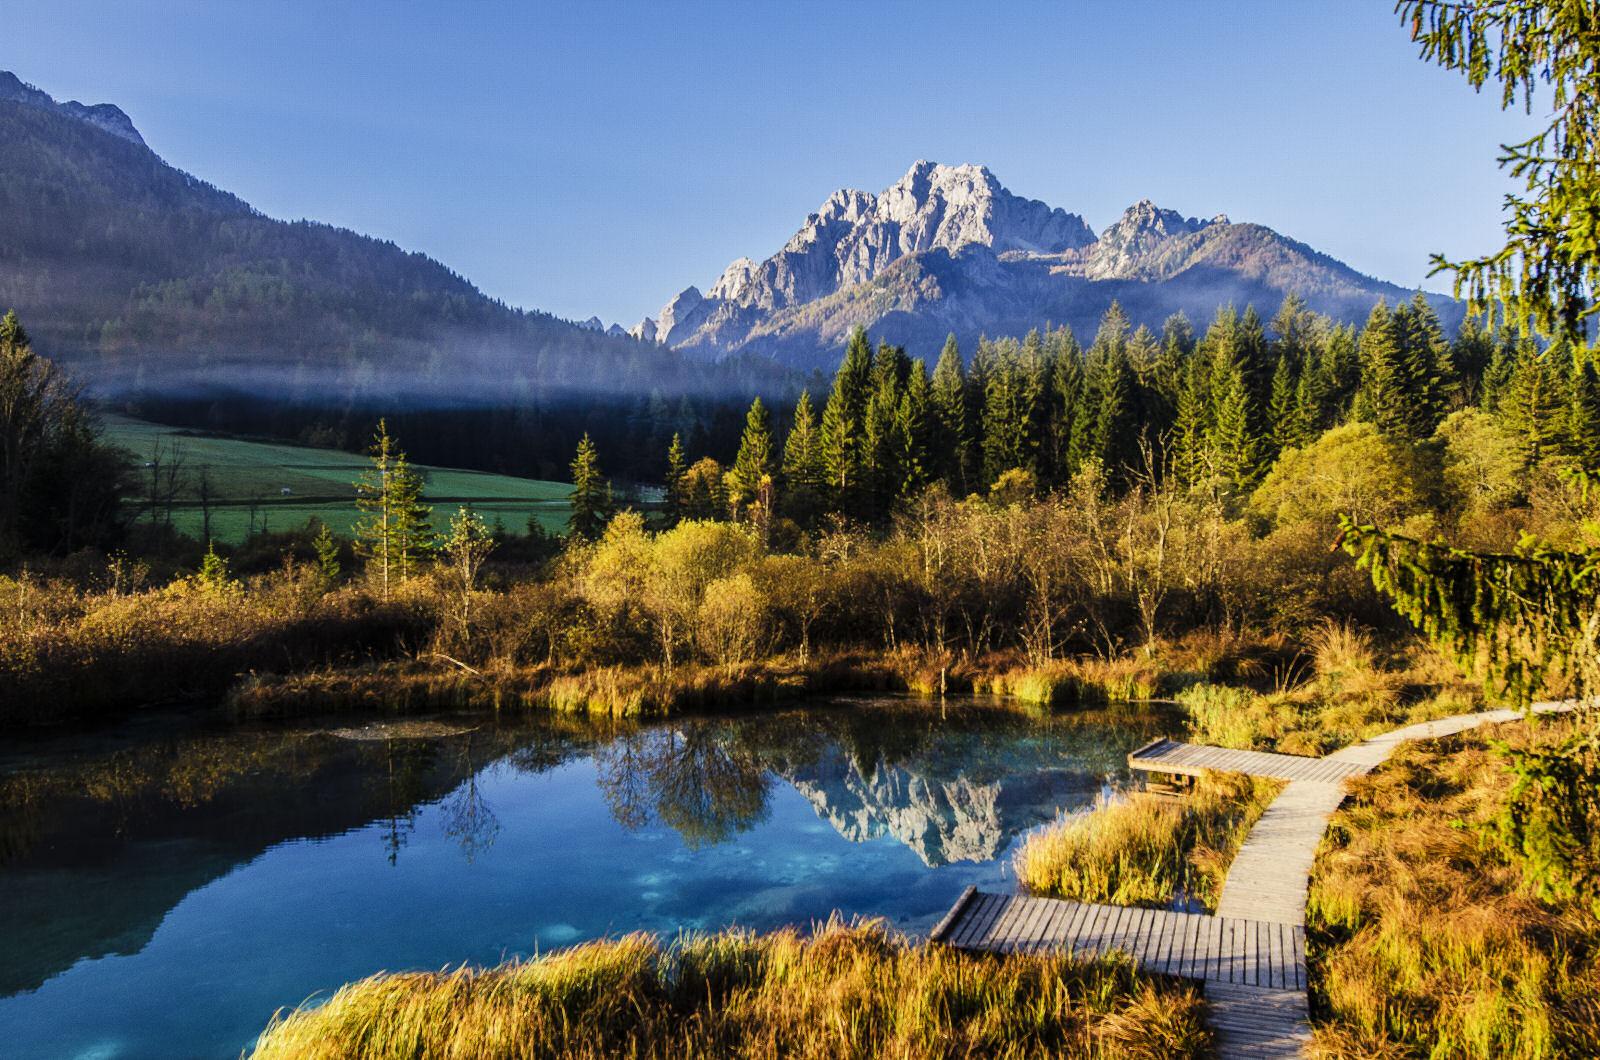 Zelenci Nature Reserve near Kranjska Gora, Slovenia